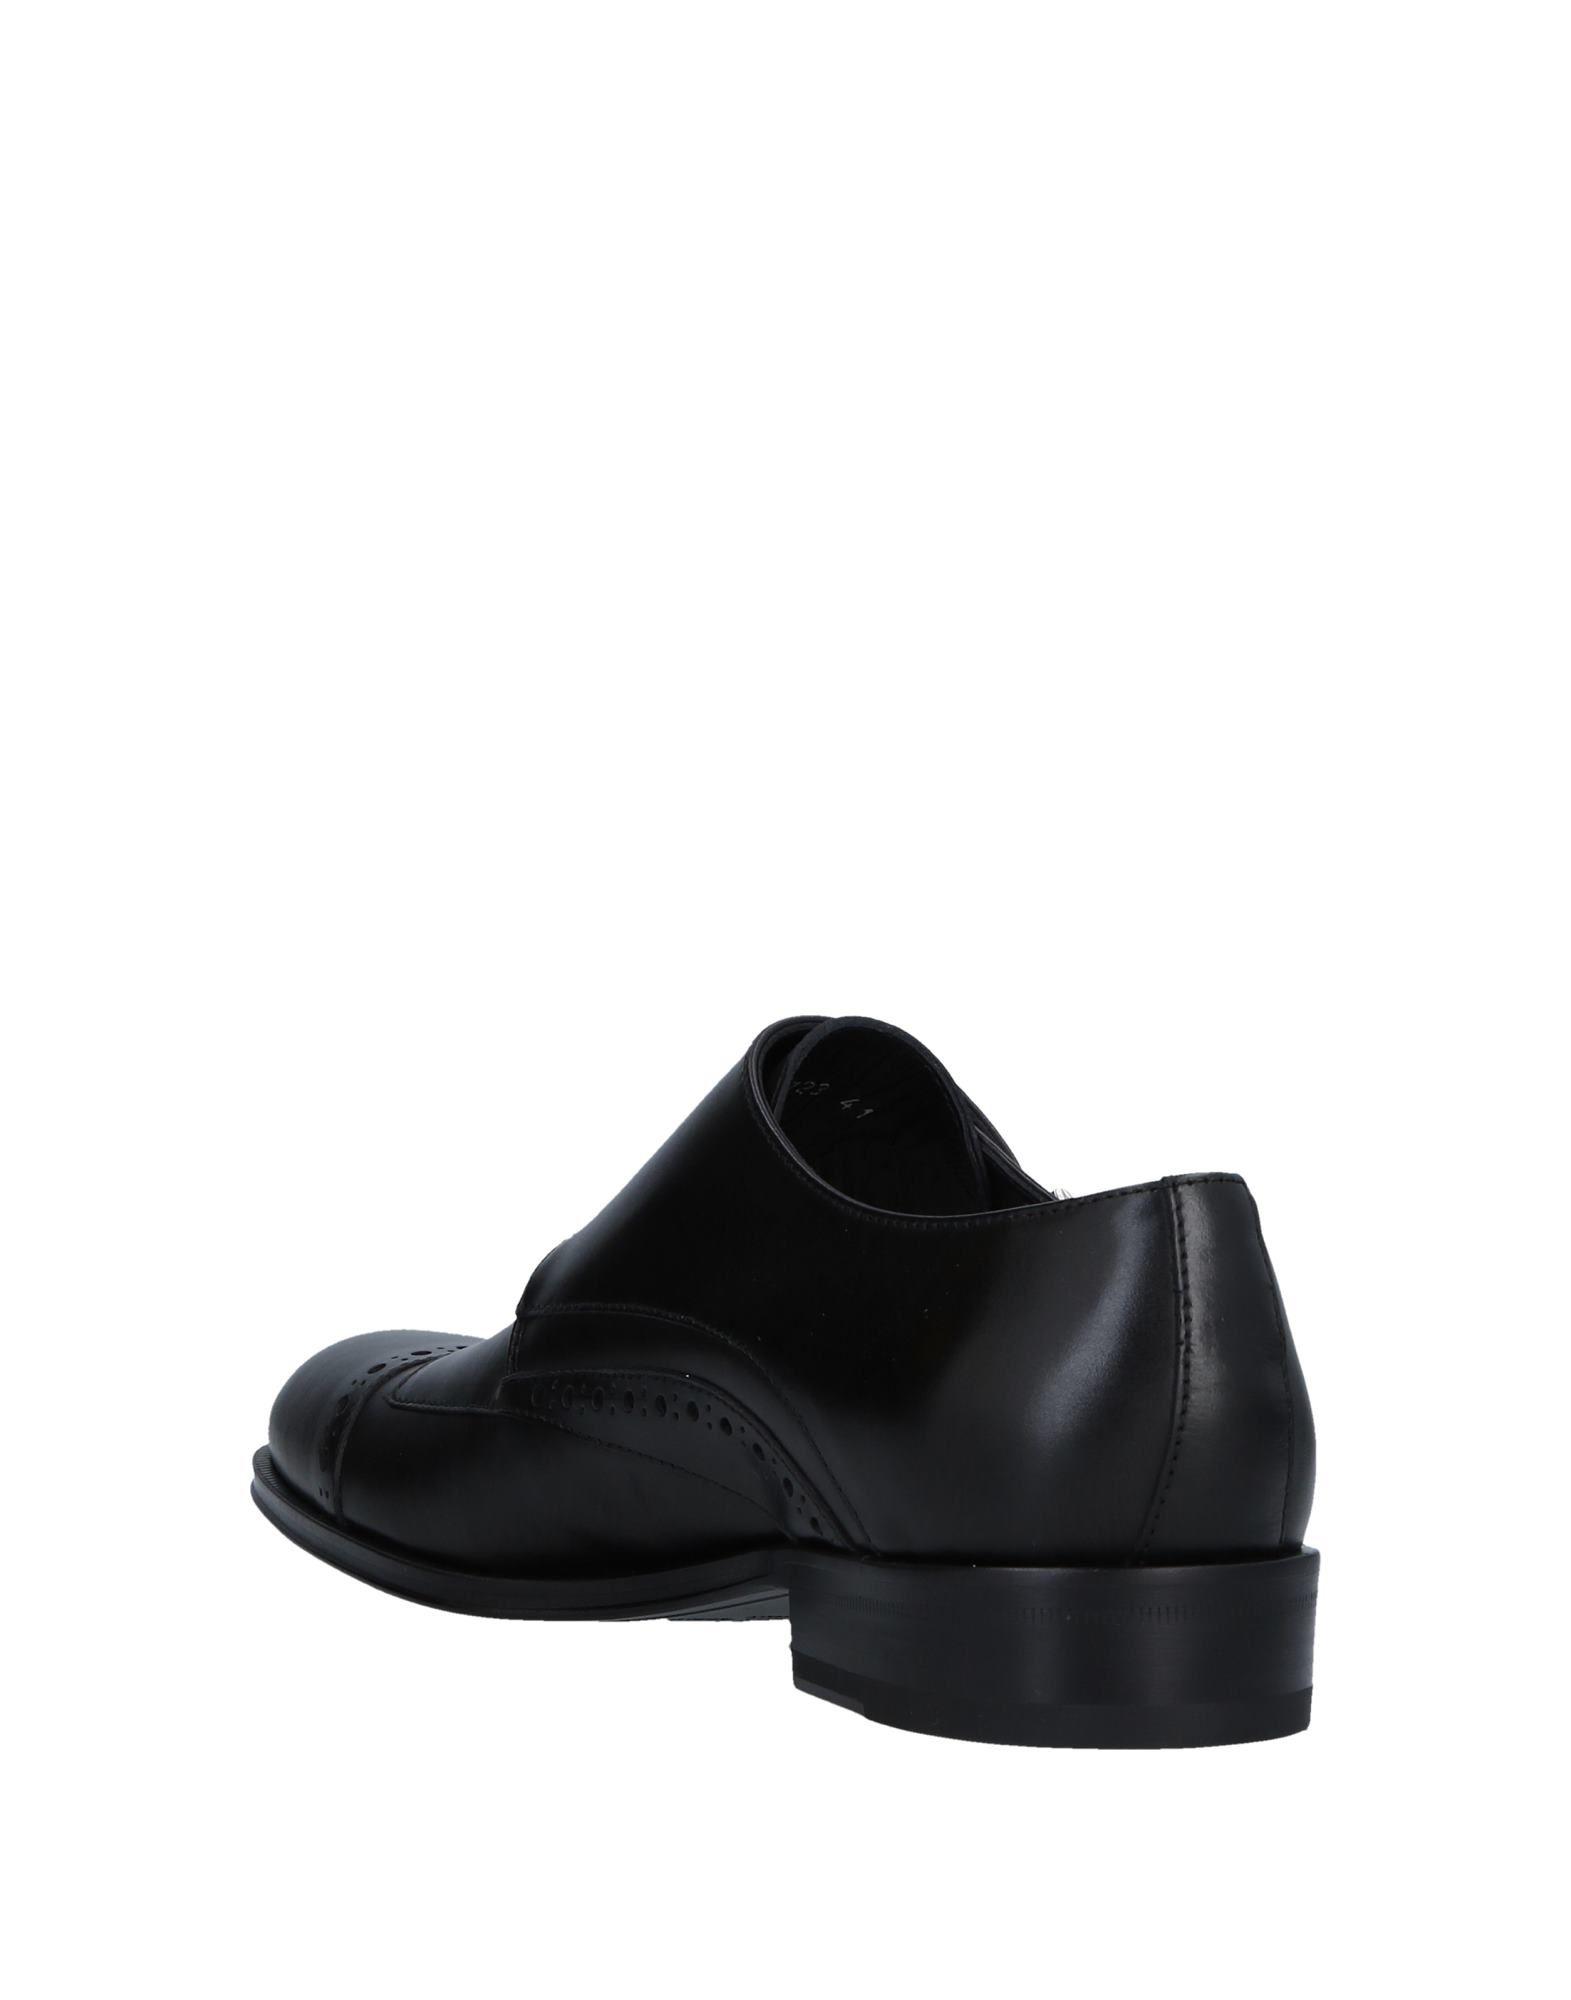 Alessandro Mokassins Dell'acqua Mokassins Alessandro Herren  11534886TE Neue Schuhe 015f11